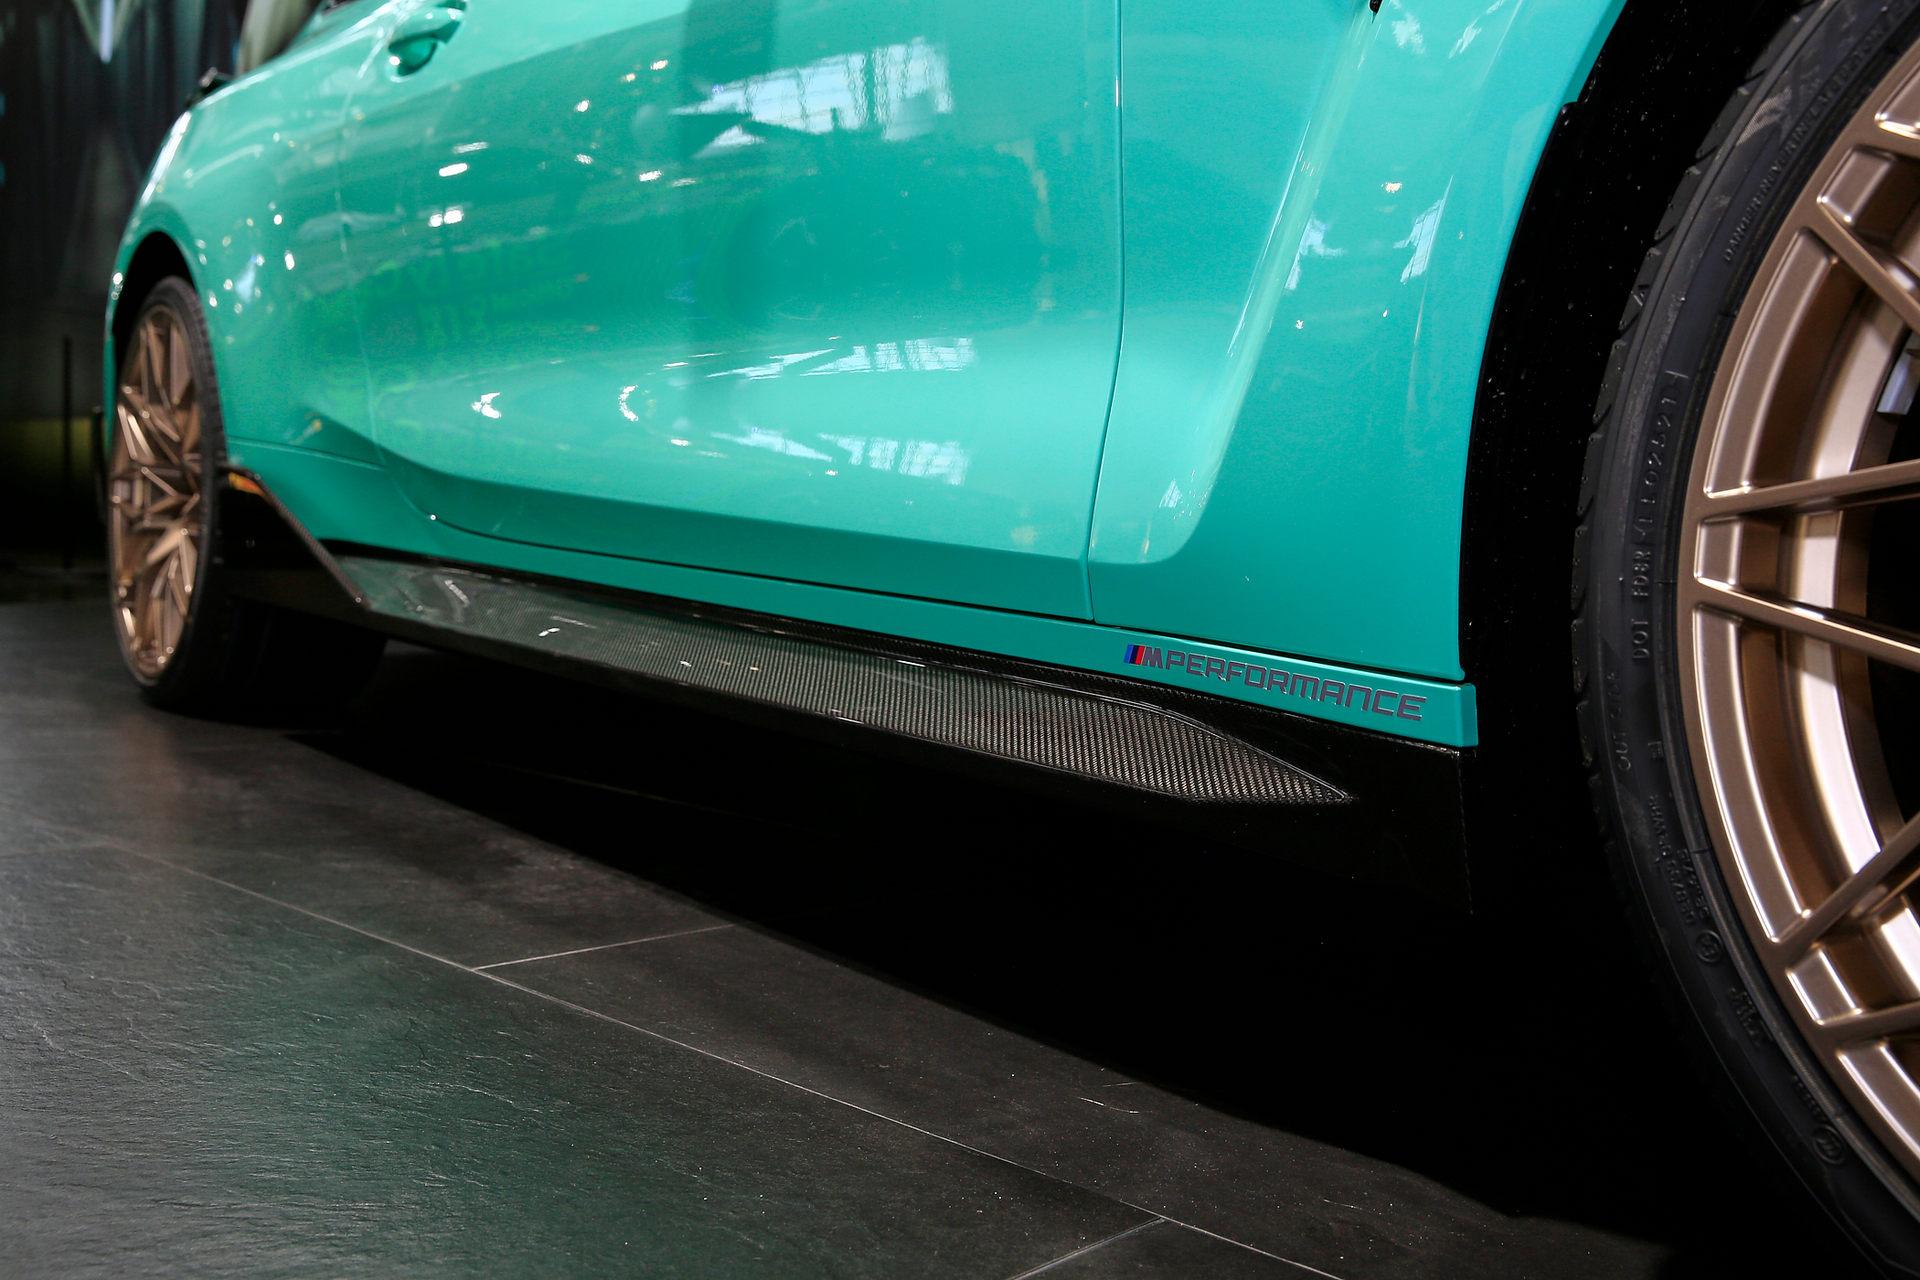 بي إم دبليو BMW M4 Competition تصميم الجانبي